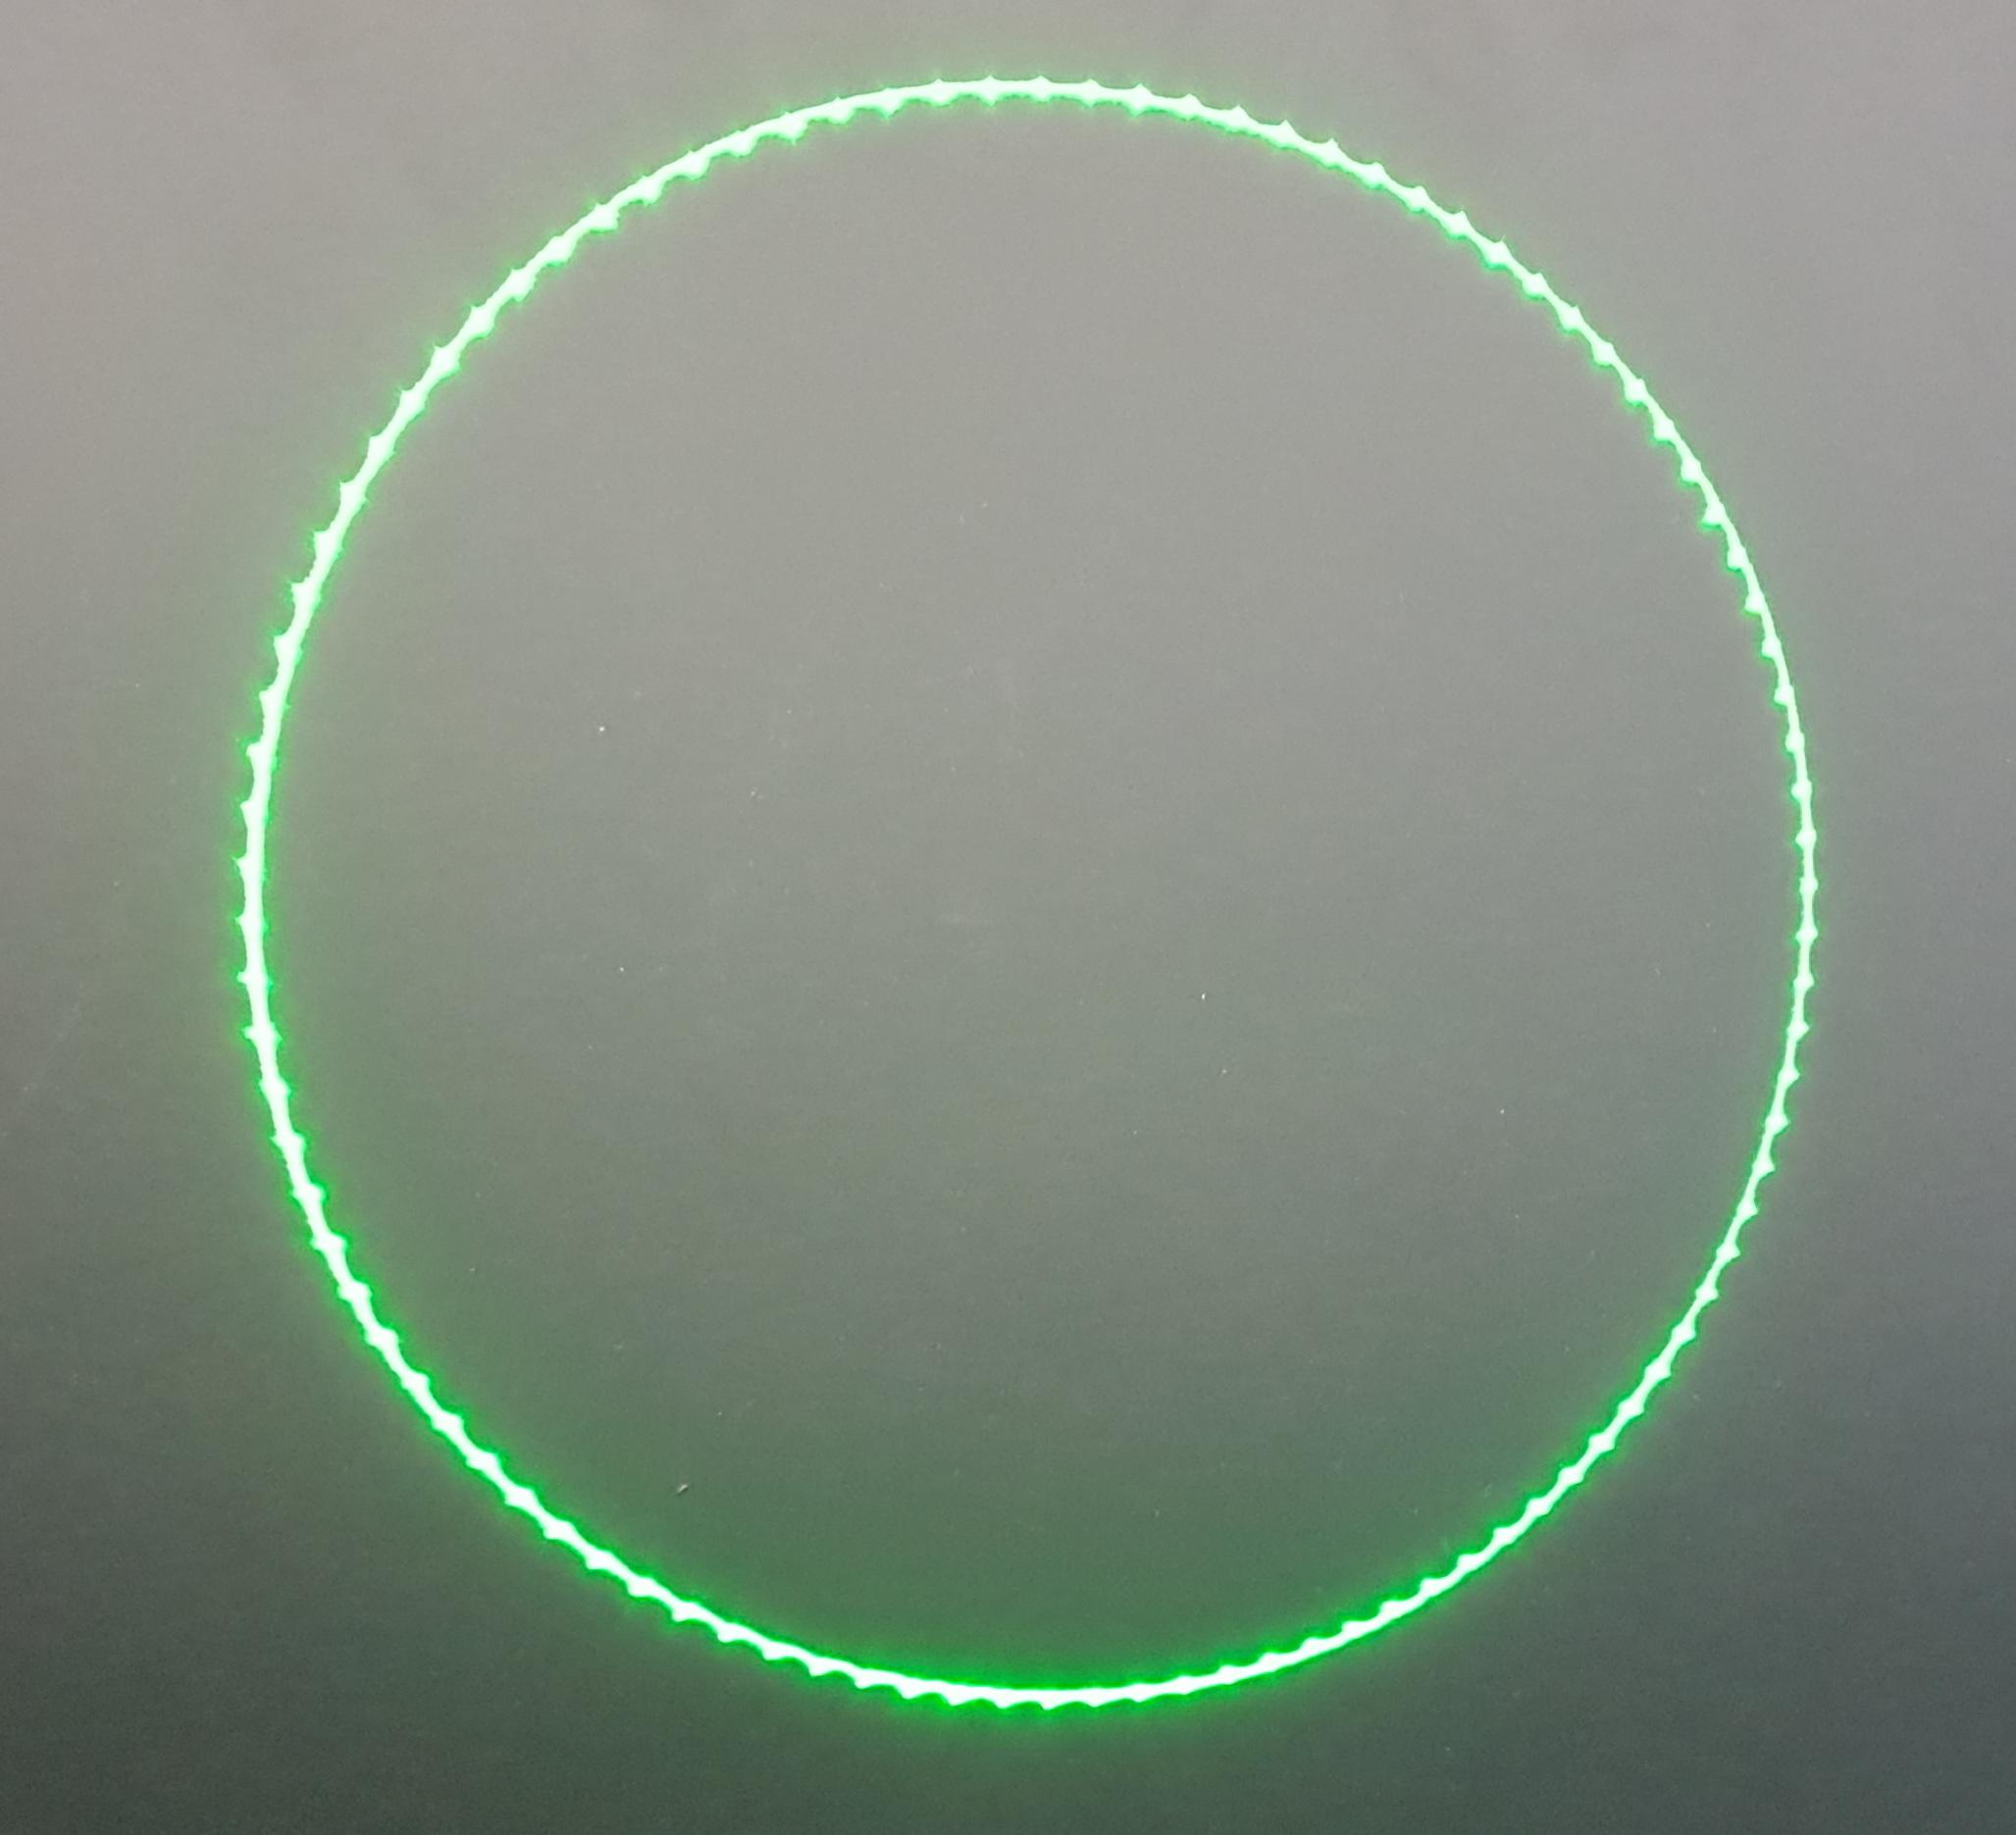 7i96-xy2mod-test_circle_pos.jpg